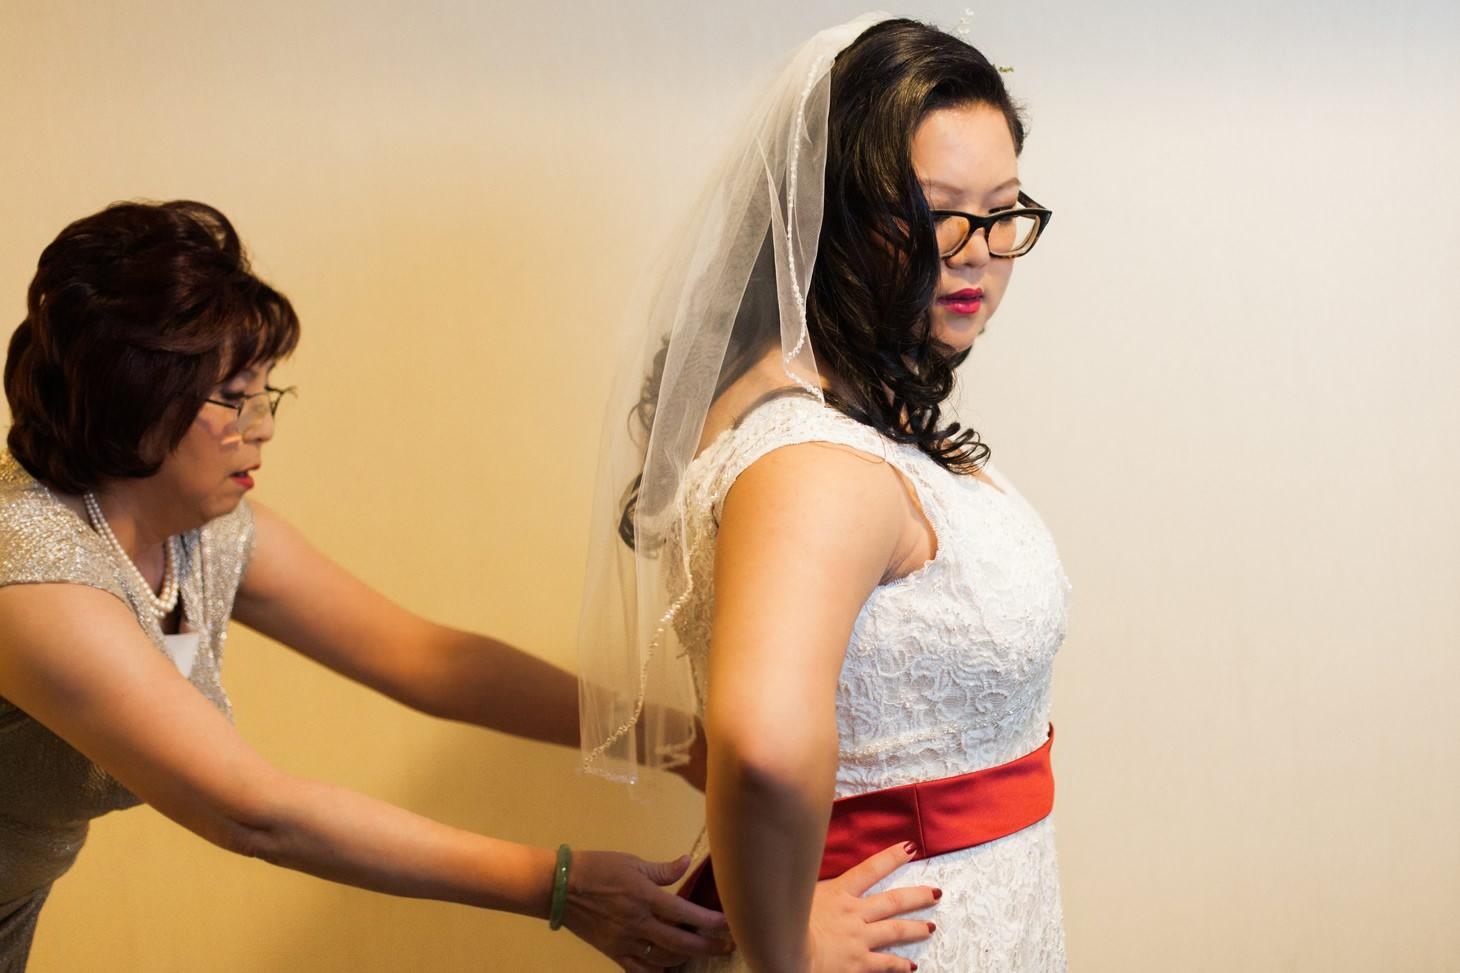 004-nyc-wedding-portrait-photographer-times-square-muse-hotel-winter-wedding-smitten-chickens.jpg